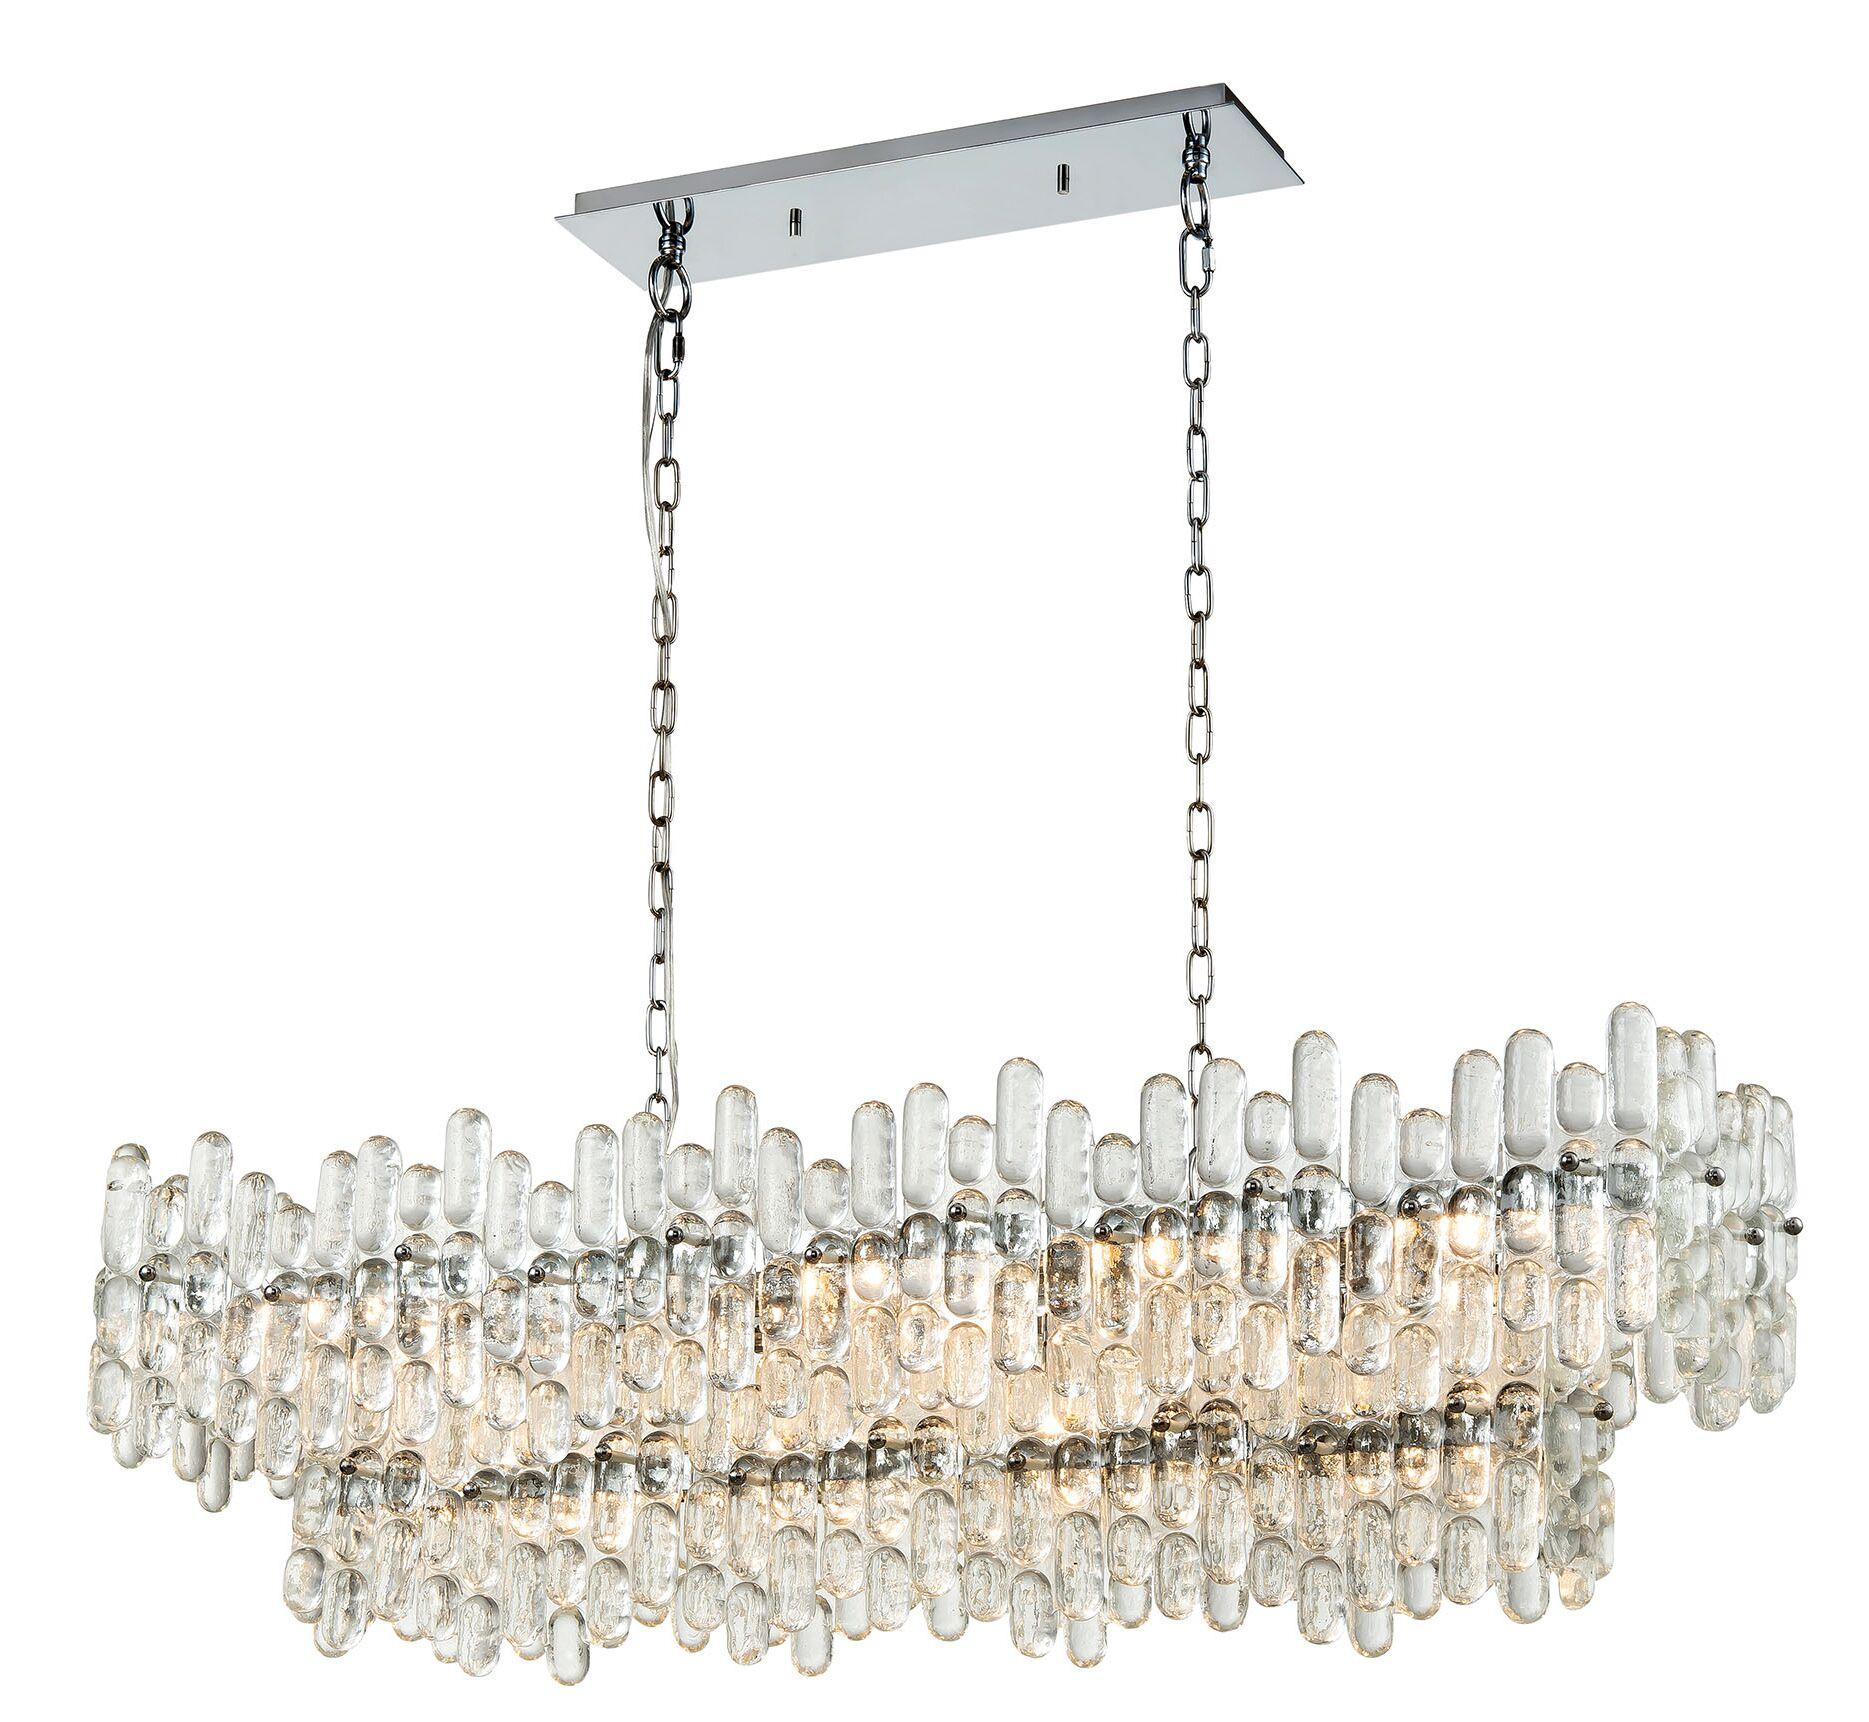 Speer 12-Light Crystal Chandelier